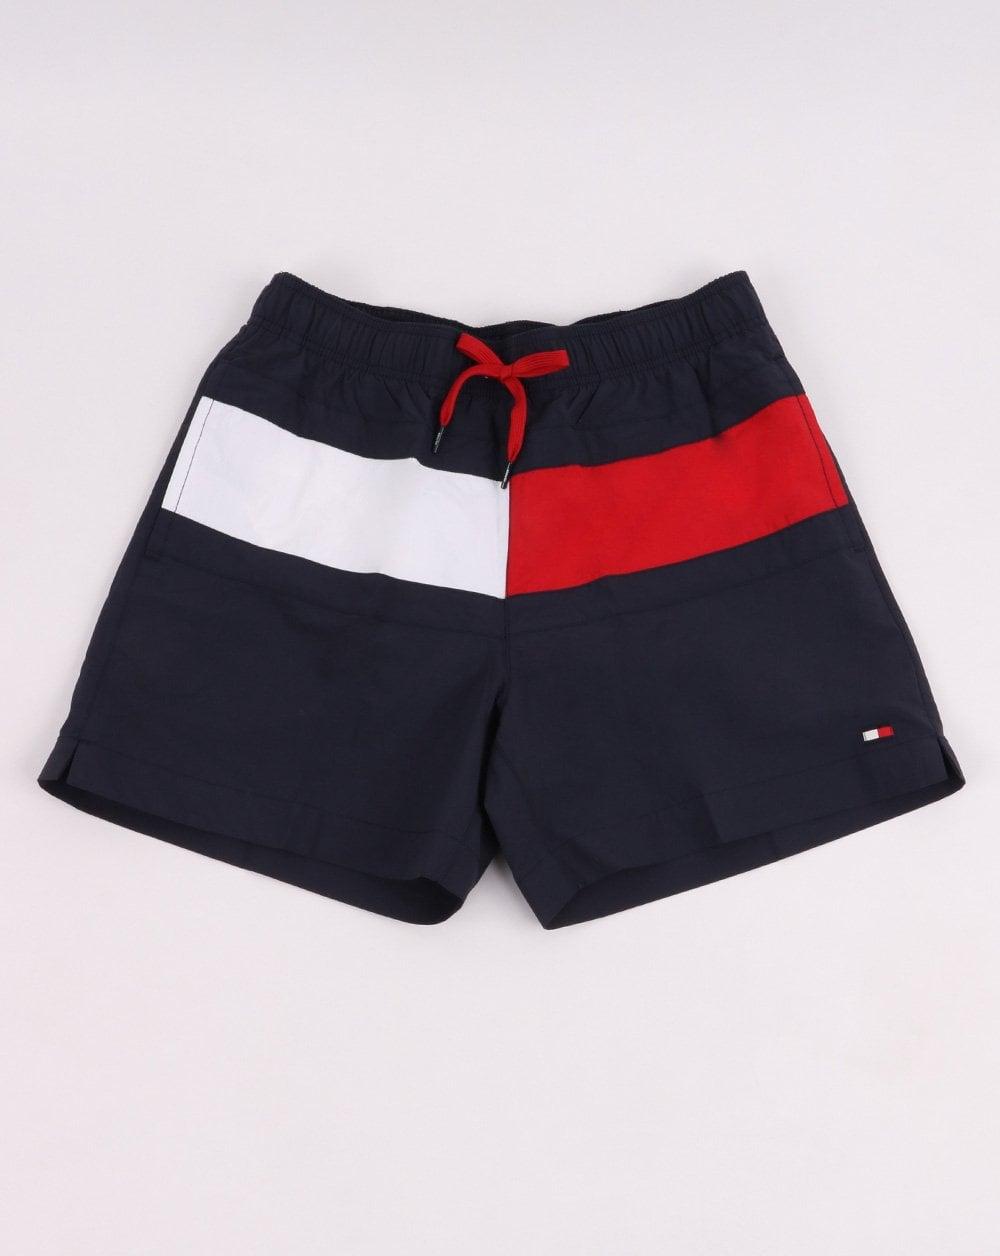 b889266c1d13 Tommy Hilfiger Flag Shorts Navy/Red/White